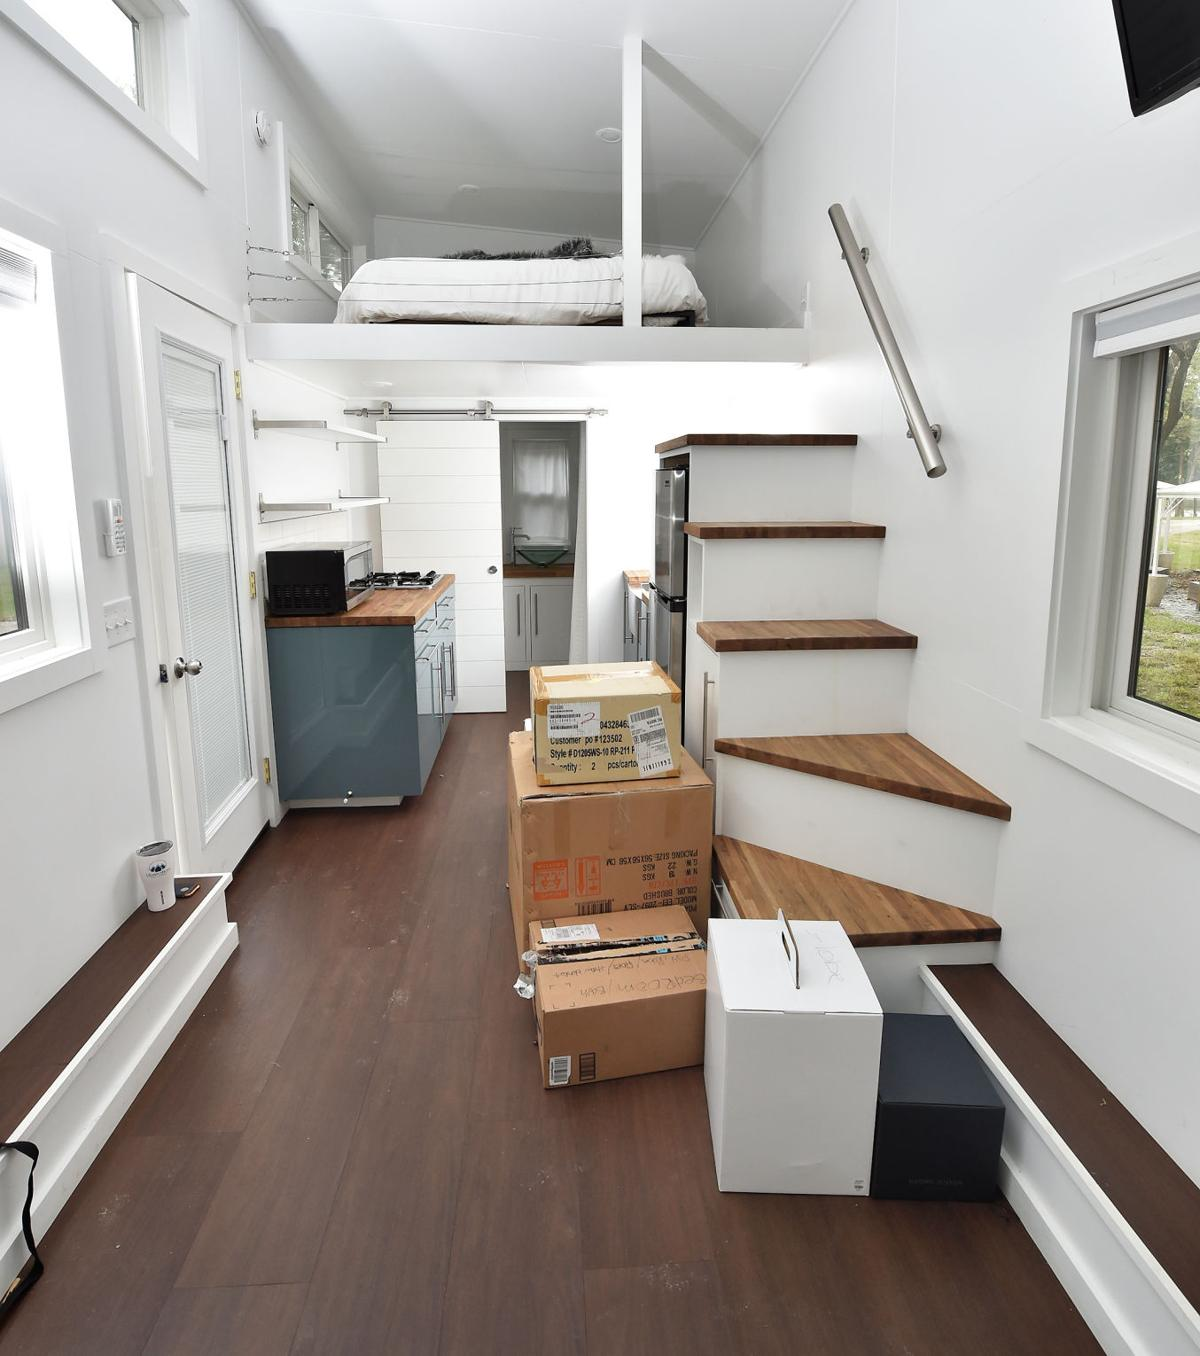 Kevin Hart brings Lancaster tiny house to NYC [photos]   Local News on mobile home loft, design loft, california loft, cozy loft, prefab loft, rv loft, small loft, diy loft, micro house with loft, off-grid homes with loft,